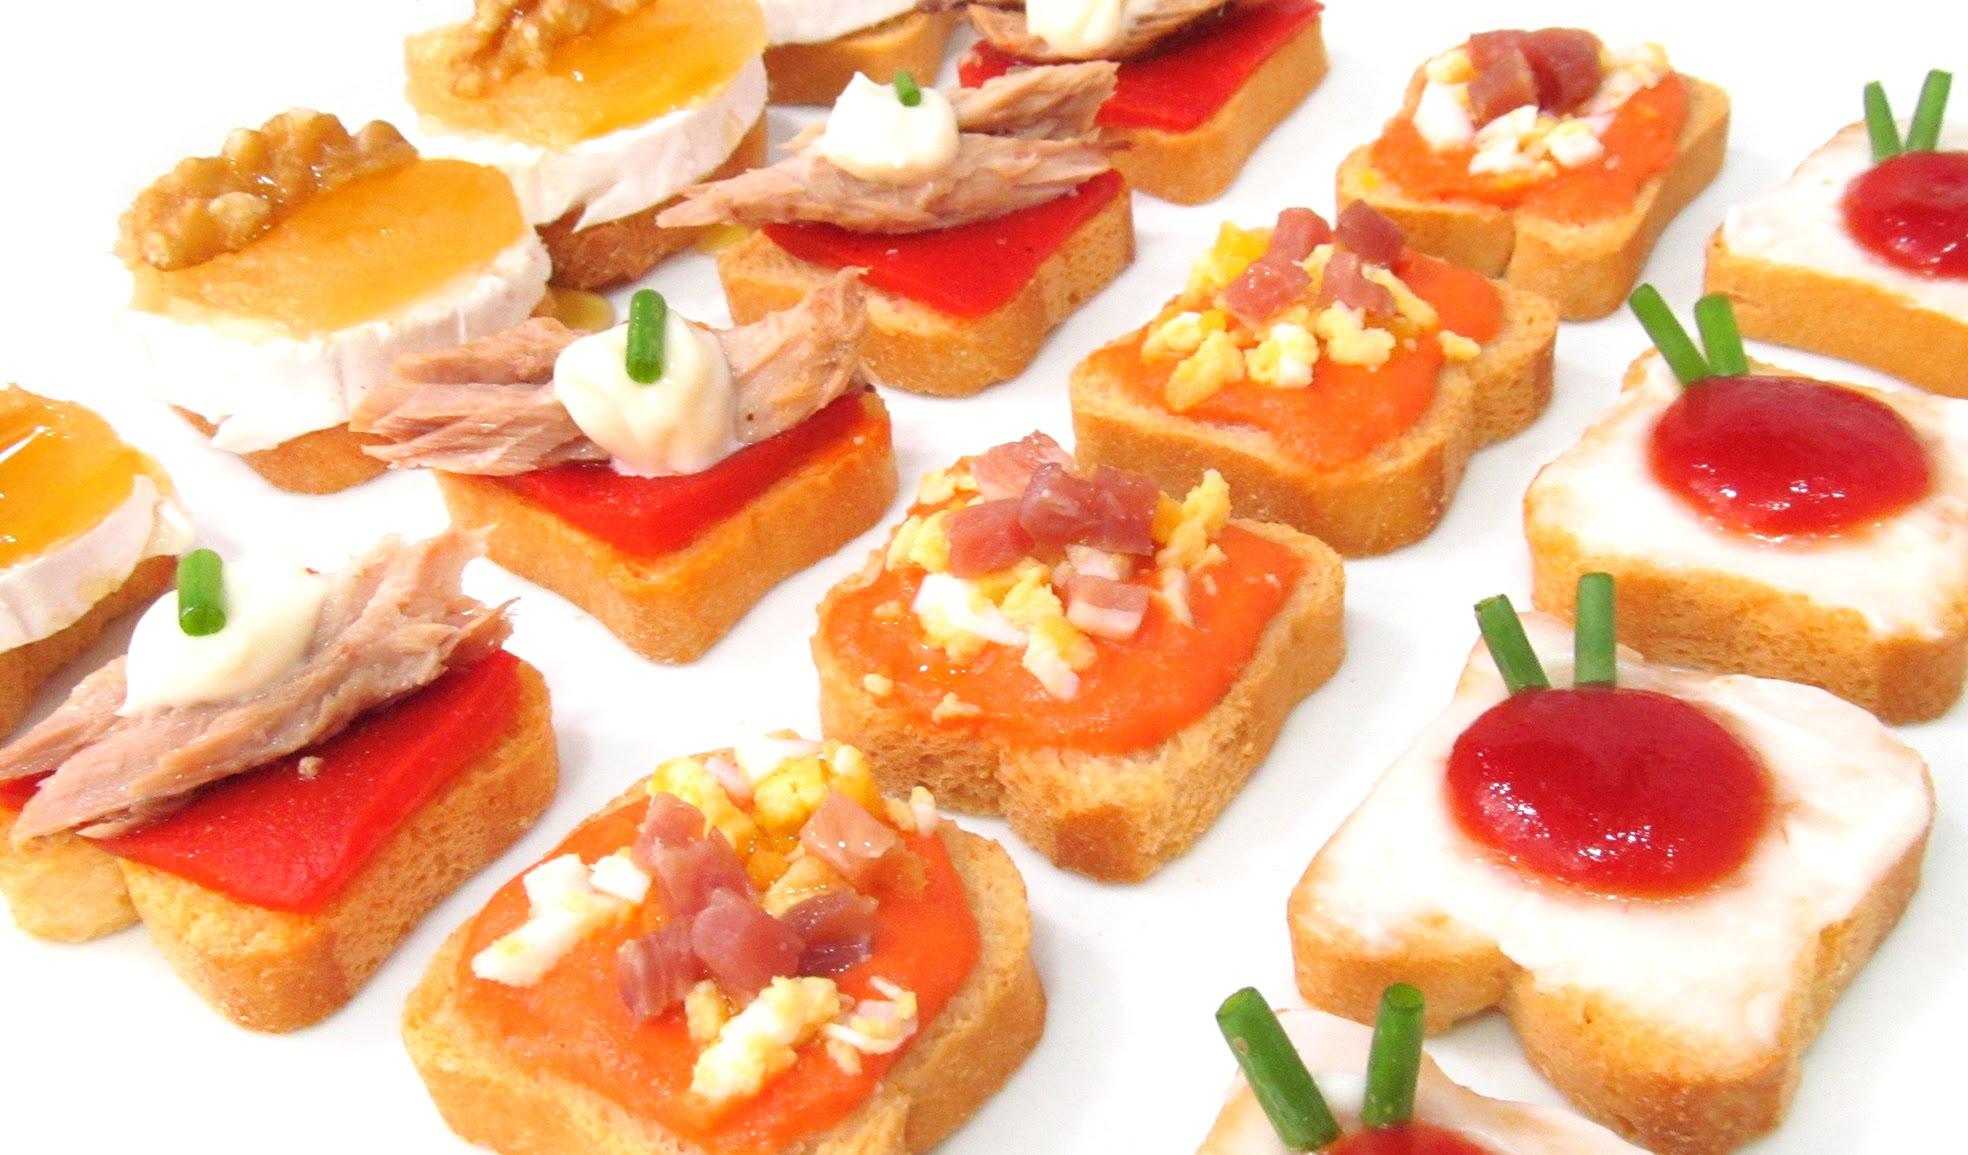 Canaps variados y baratos Hogar cocina facil